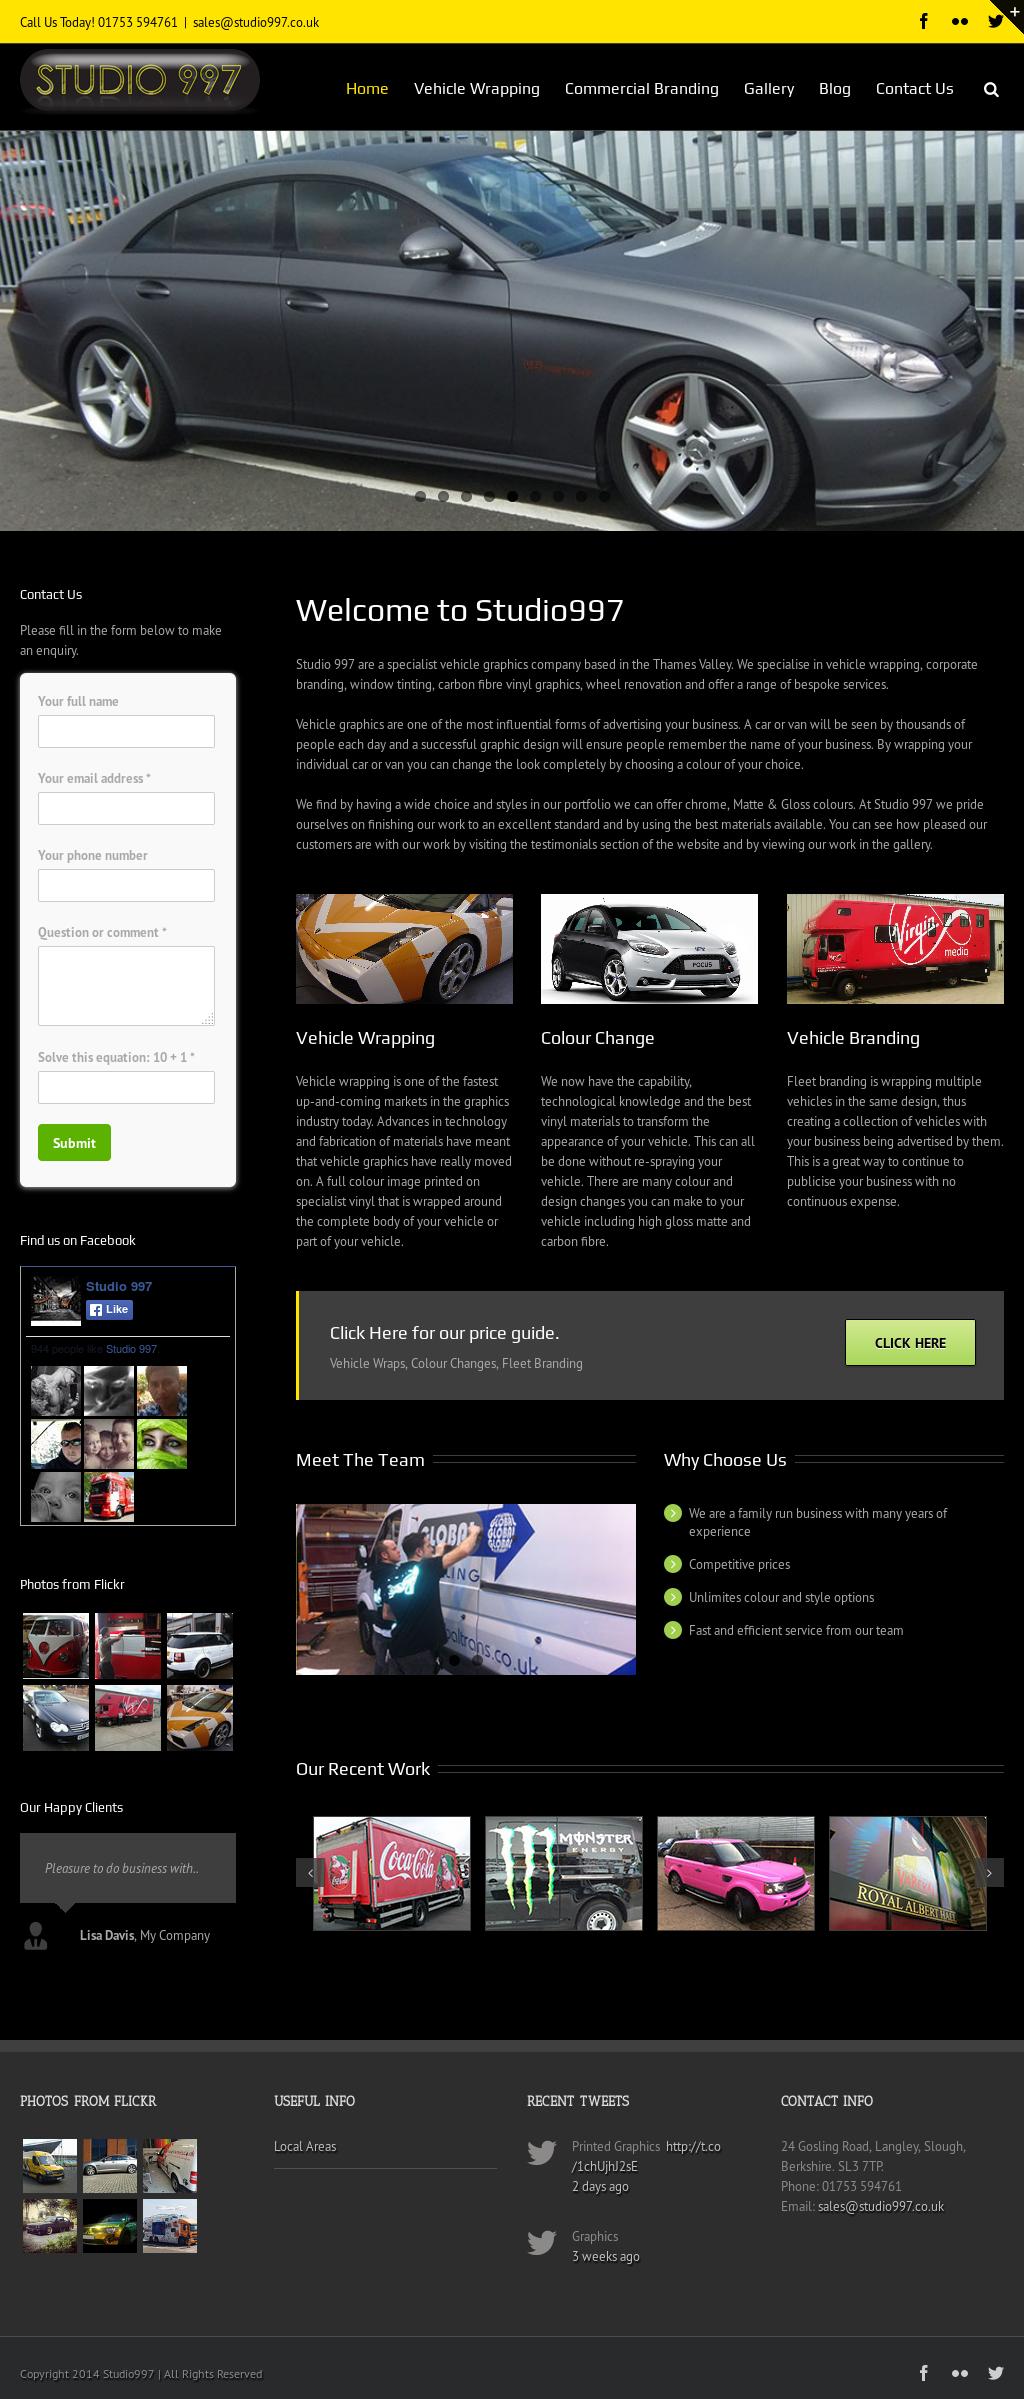 Studio997 Competitors, Revenue and Employees - Owler Company